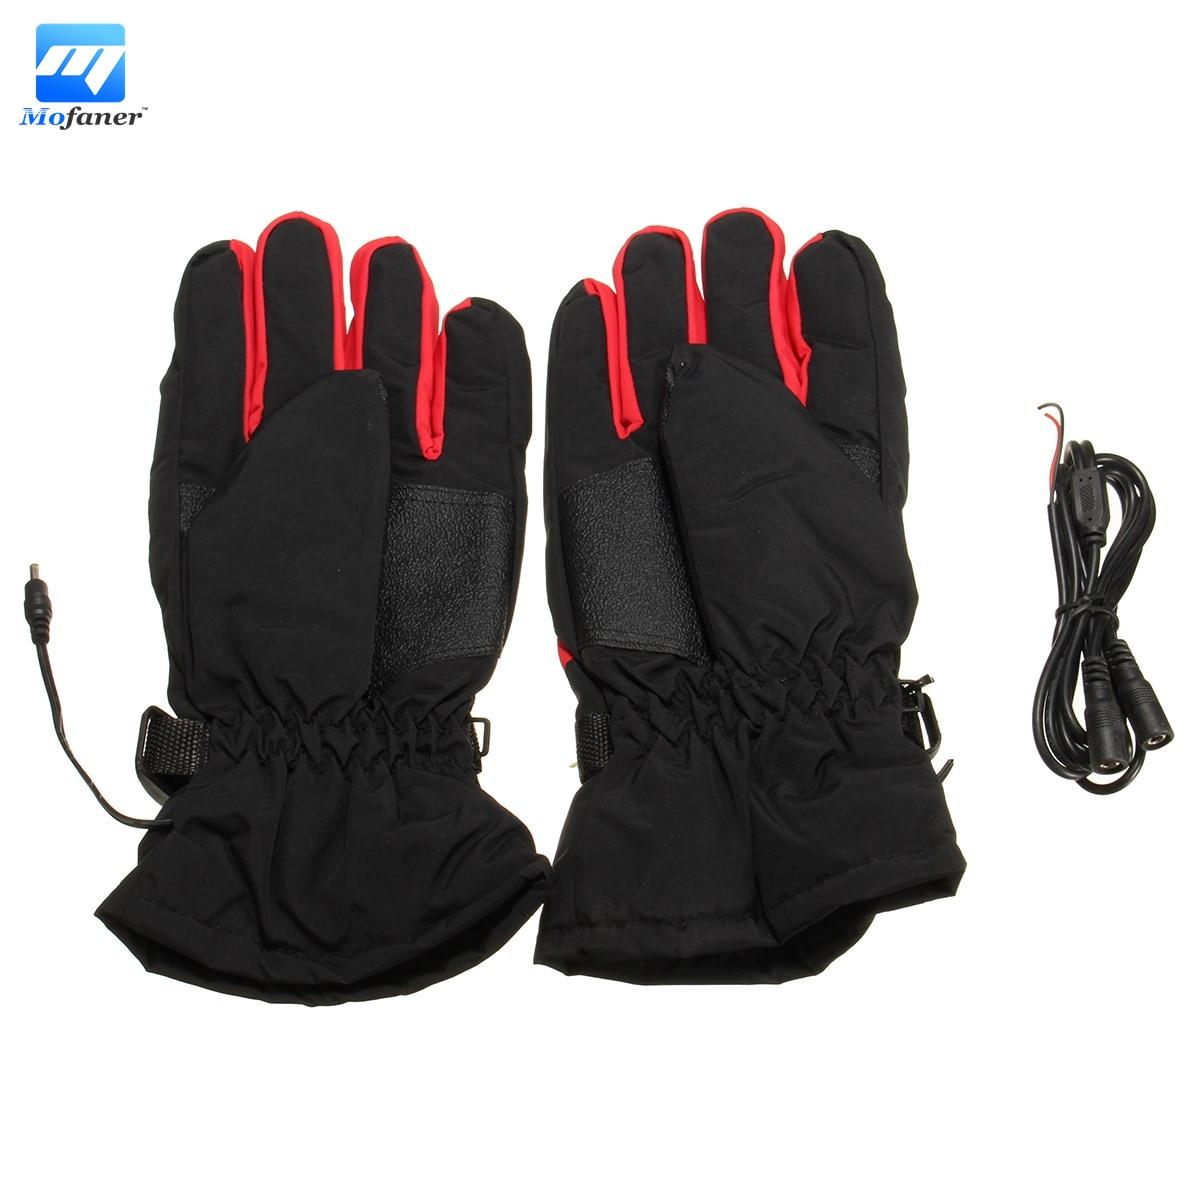 New 2pcs 12v motorcycle motorbike warm heated heat inner outdoor gloves glove china mainland